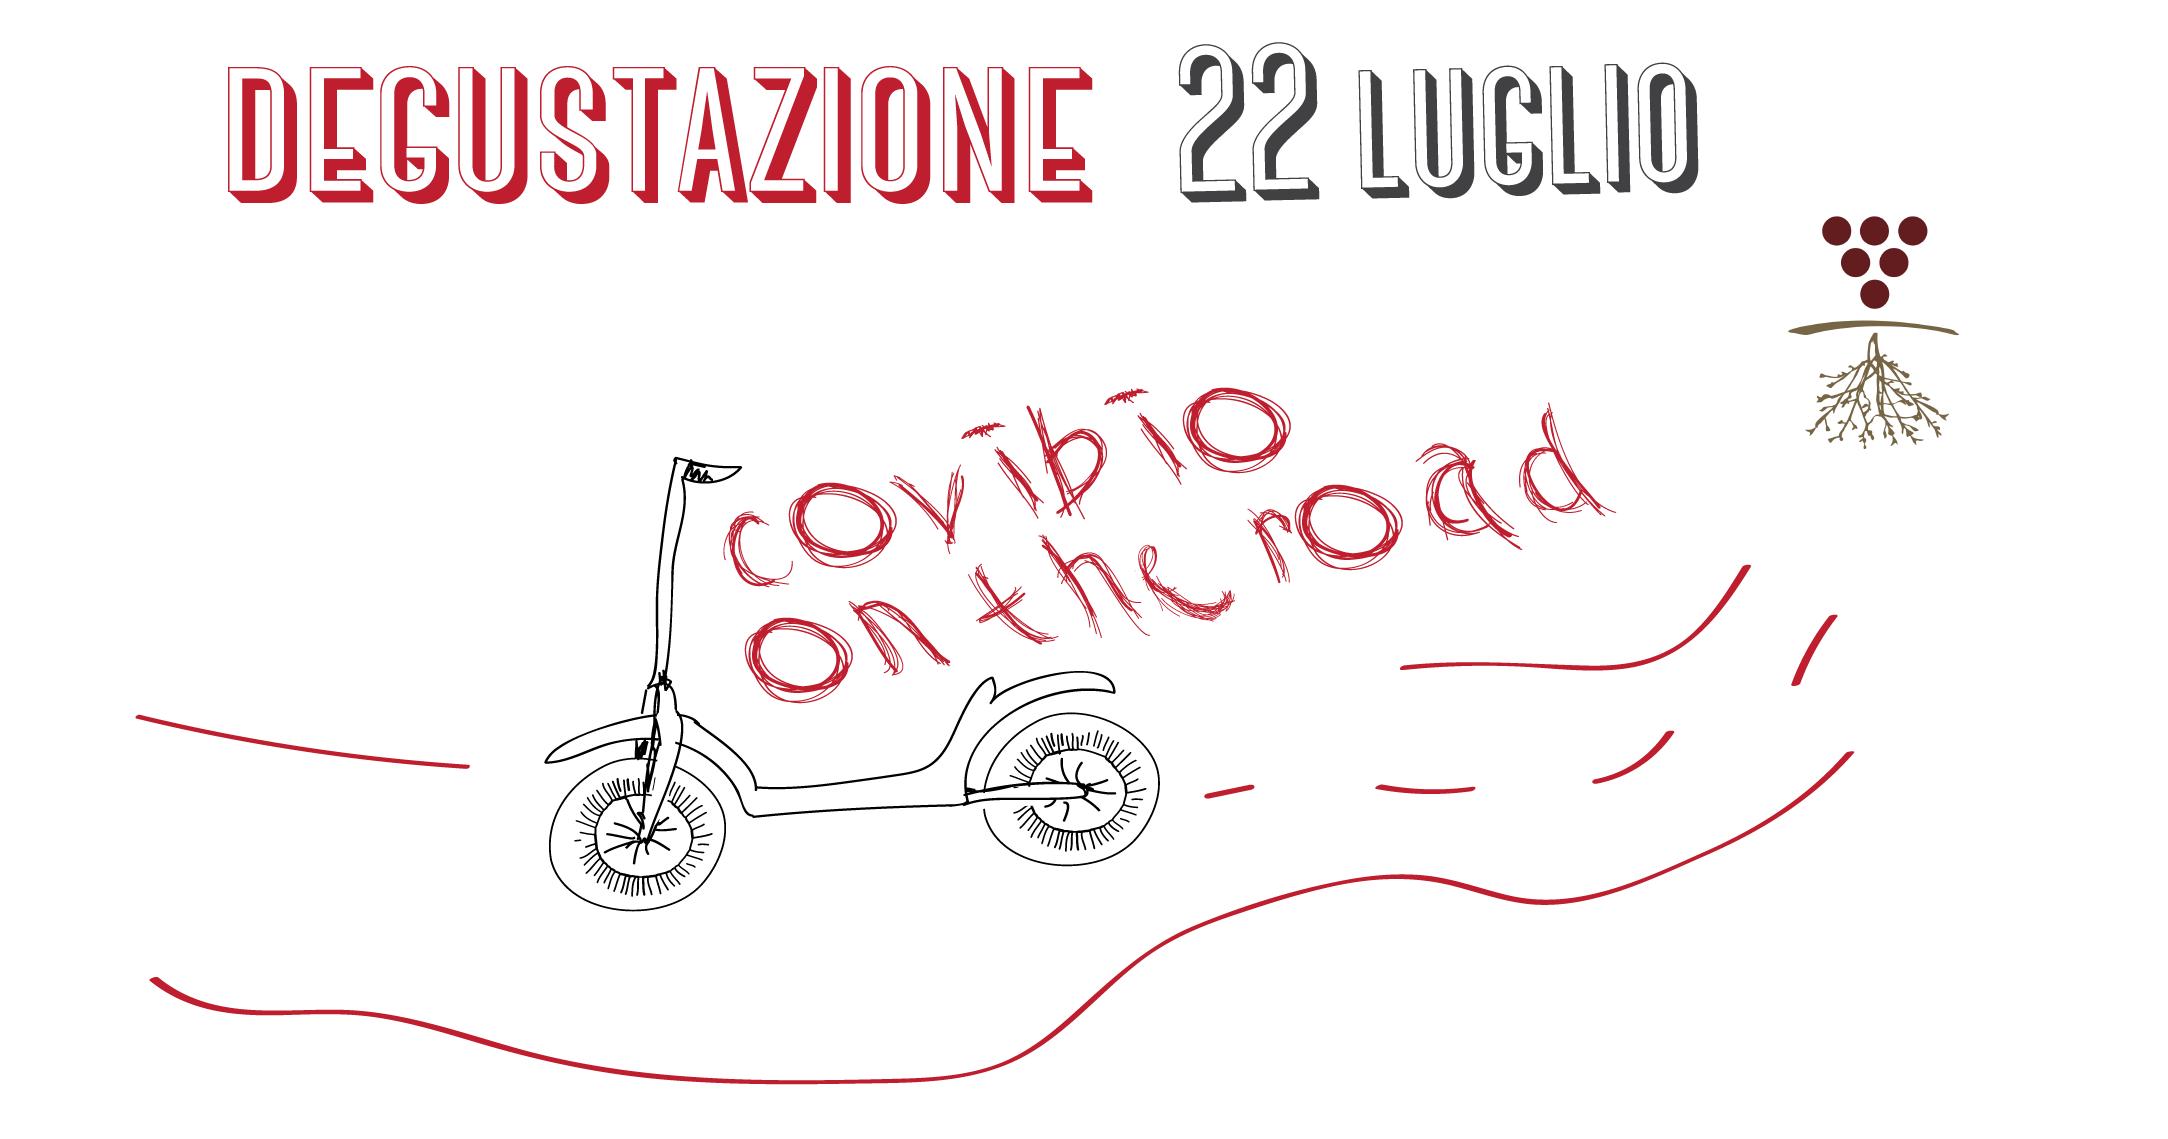 On the road – 22 luglio